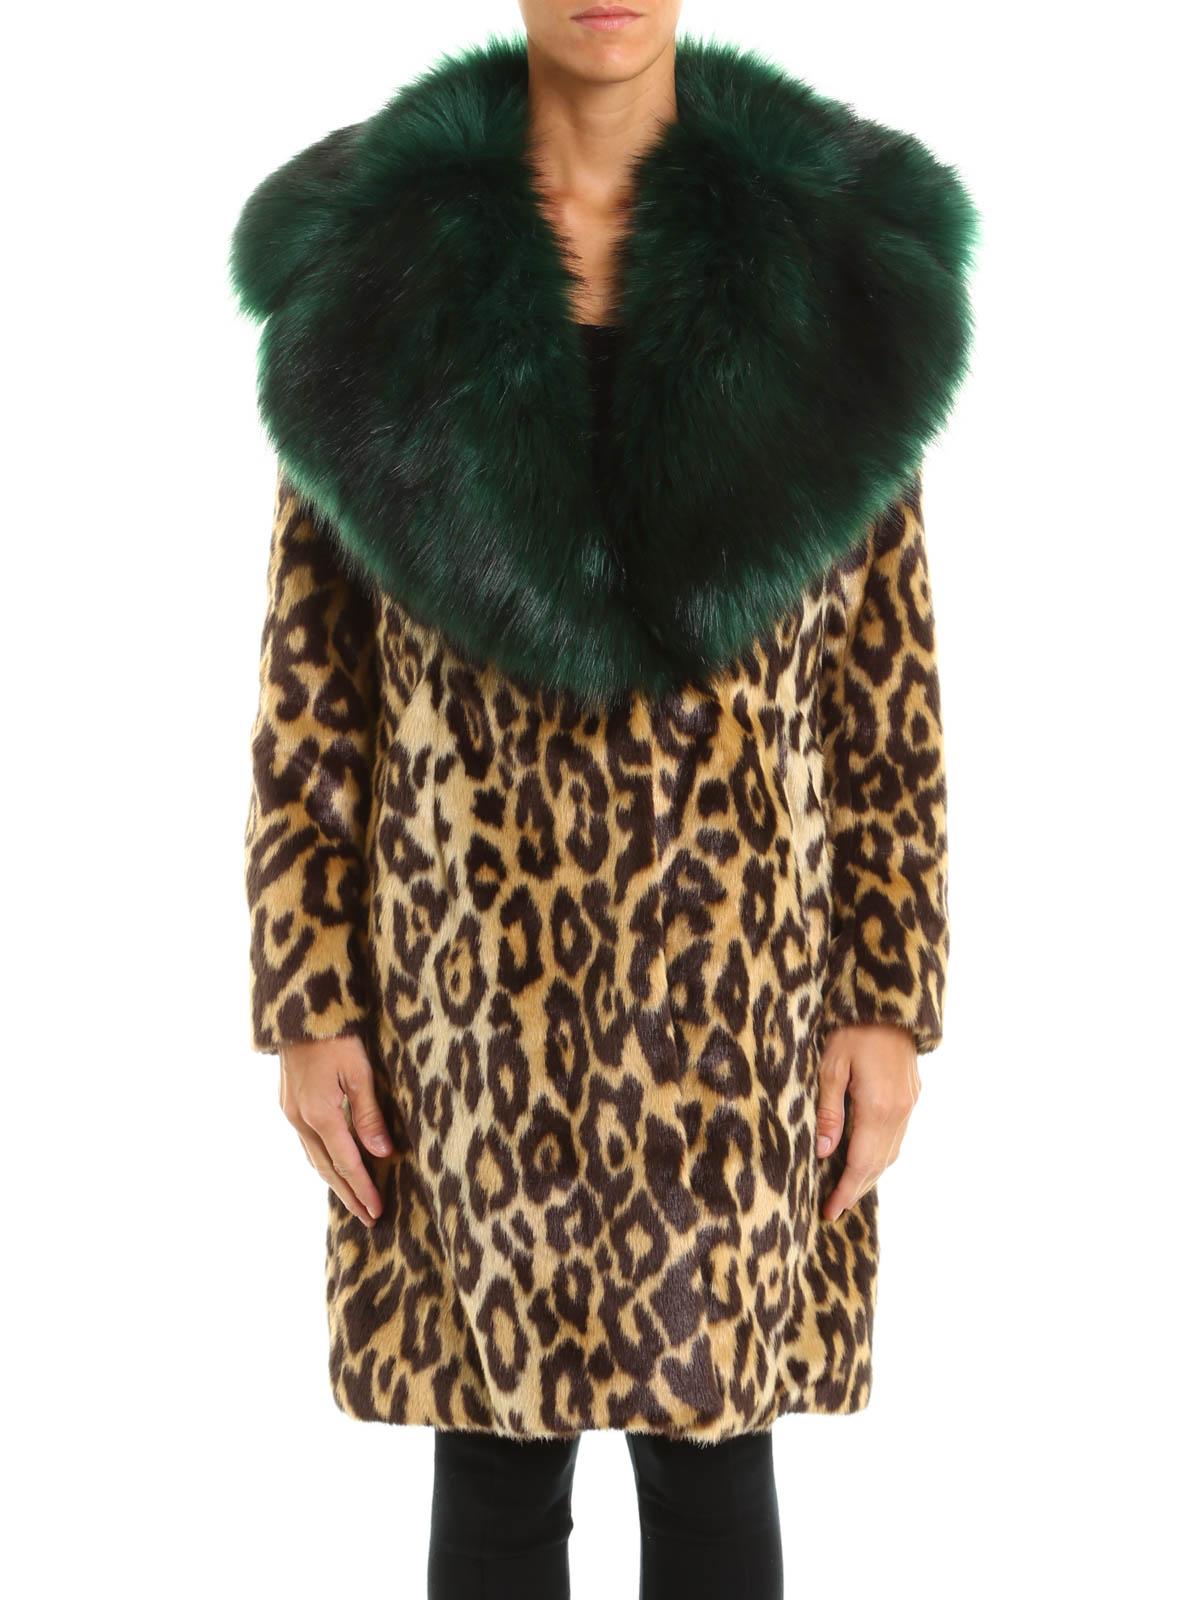 Rumba Noten amp; Shearling Coats Dries Fur Van 102912099004 Coat qEgTTO